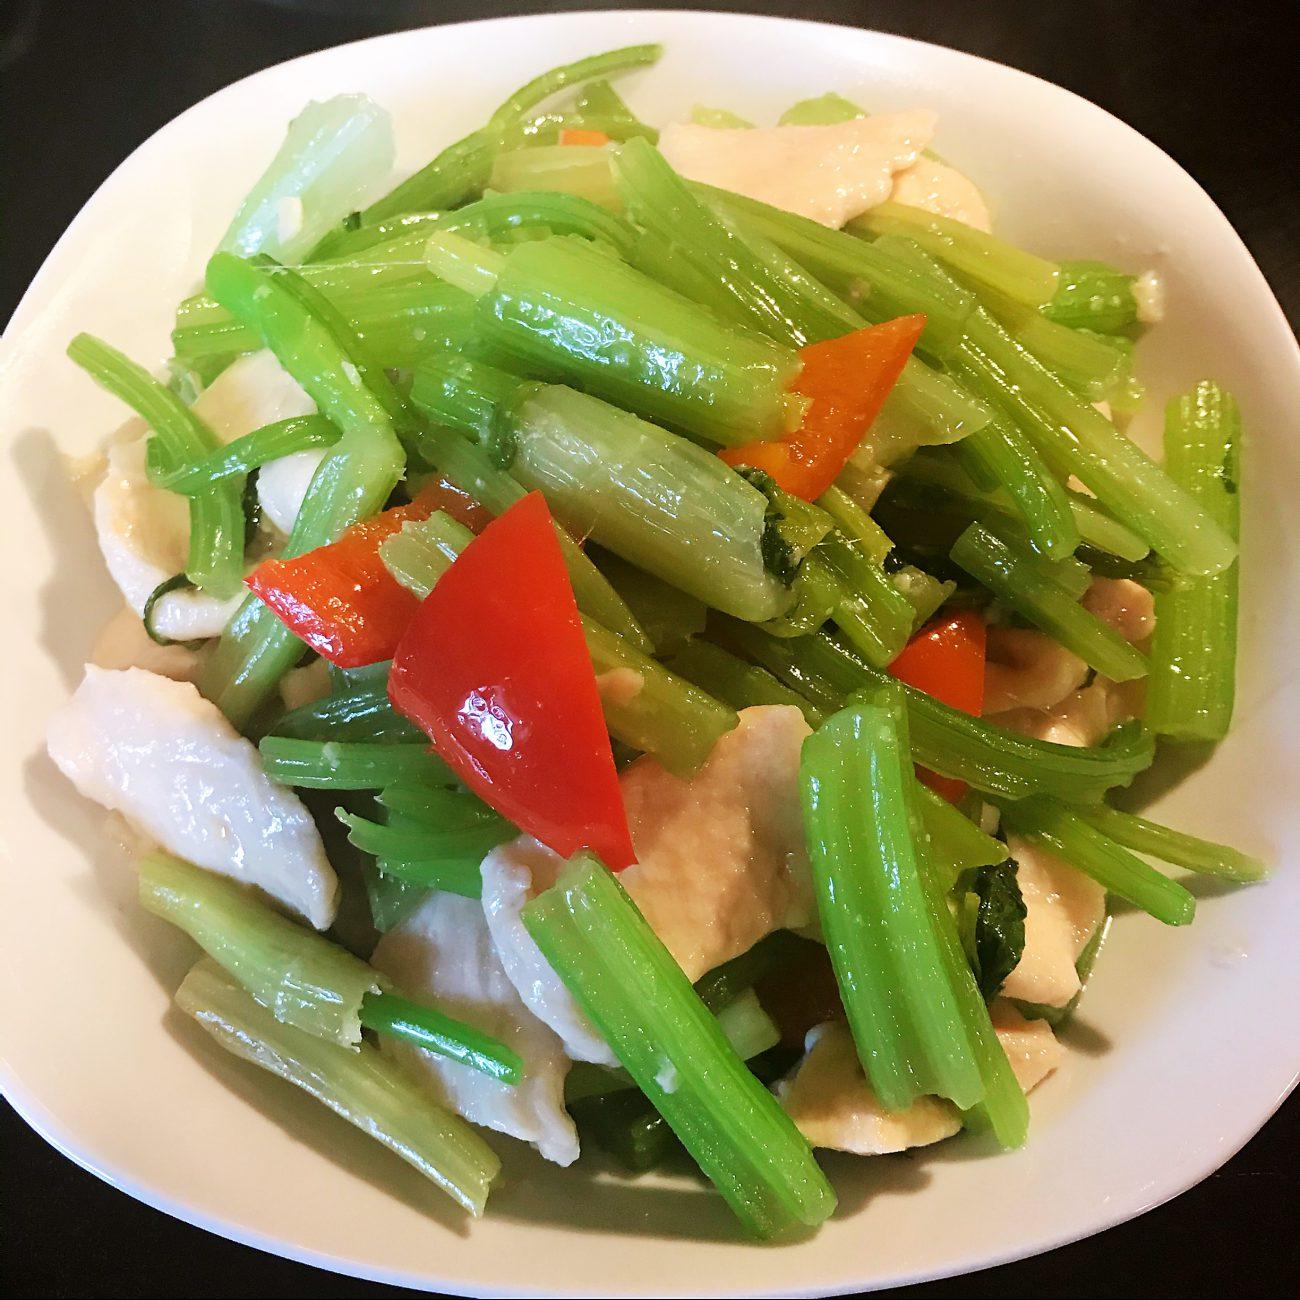 Chicken tenderloin grilled celery